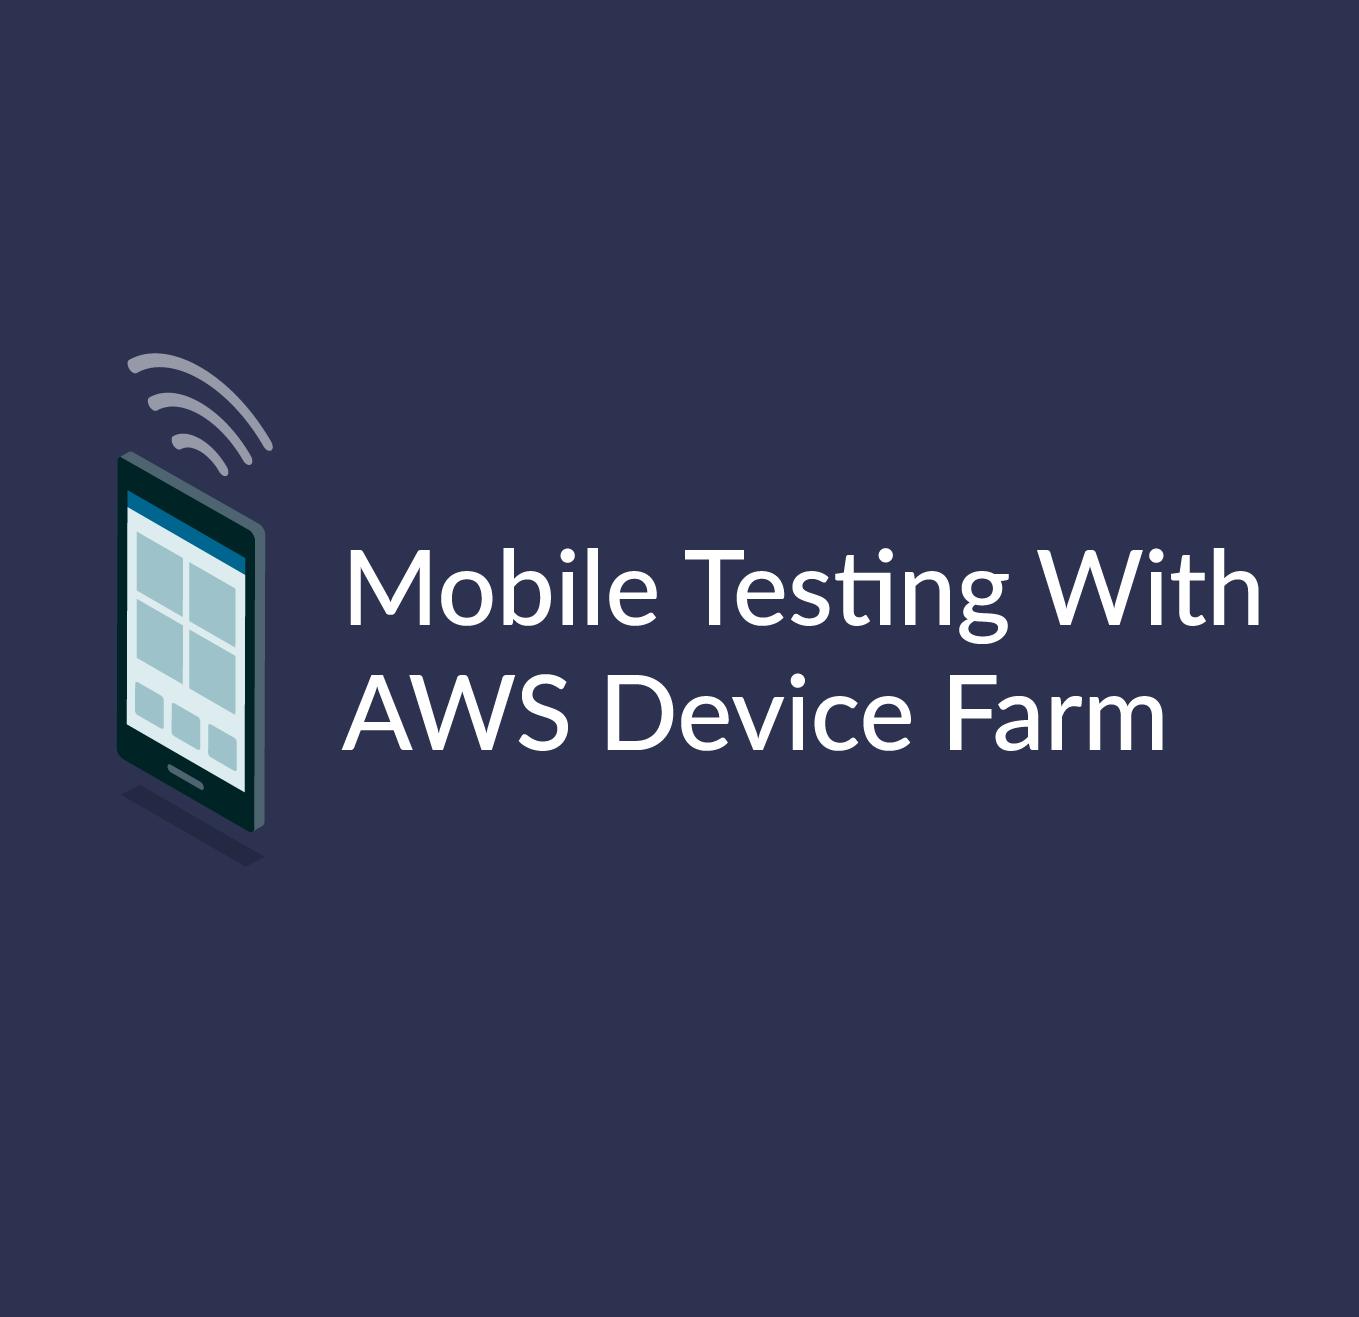 Mobile testing with AWS: Using AWS Device Farm - Cloud